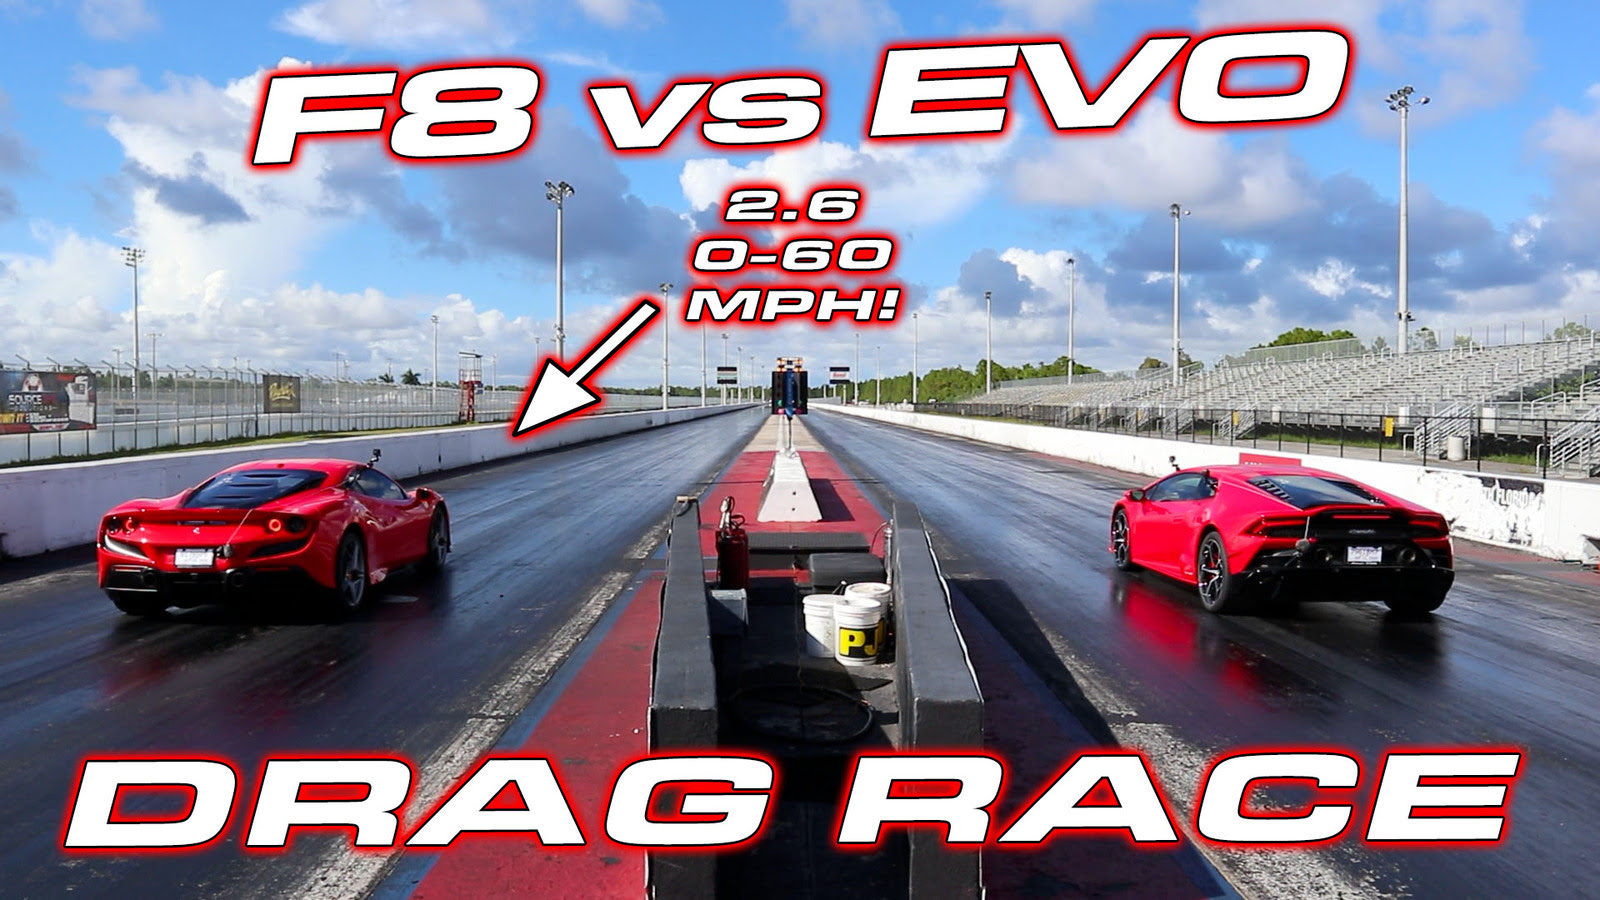 Stock 2020 Ferrari F8 Tributo 1/4 mile Drag Racing ...